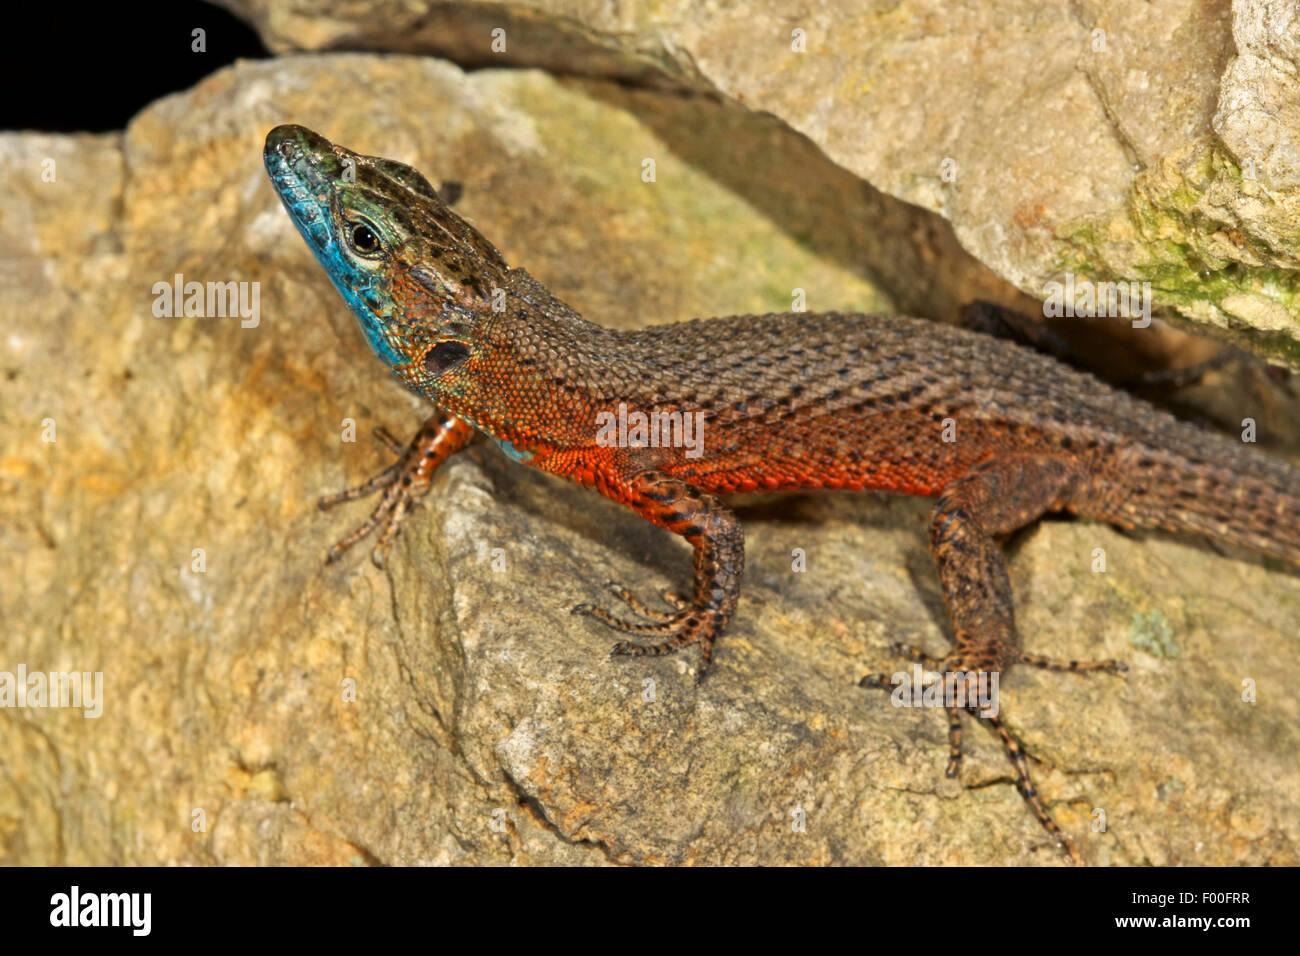 Blue-throated keeled lizard, Dalmatian Algyroides (Algyroides nigropunctatus), male on stones Stock Photo